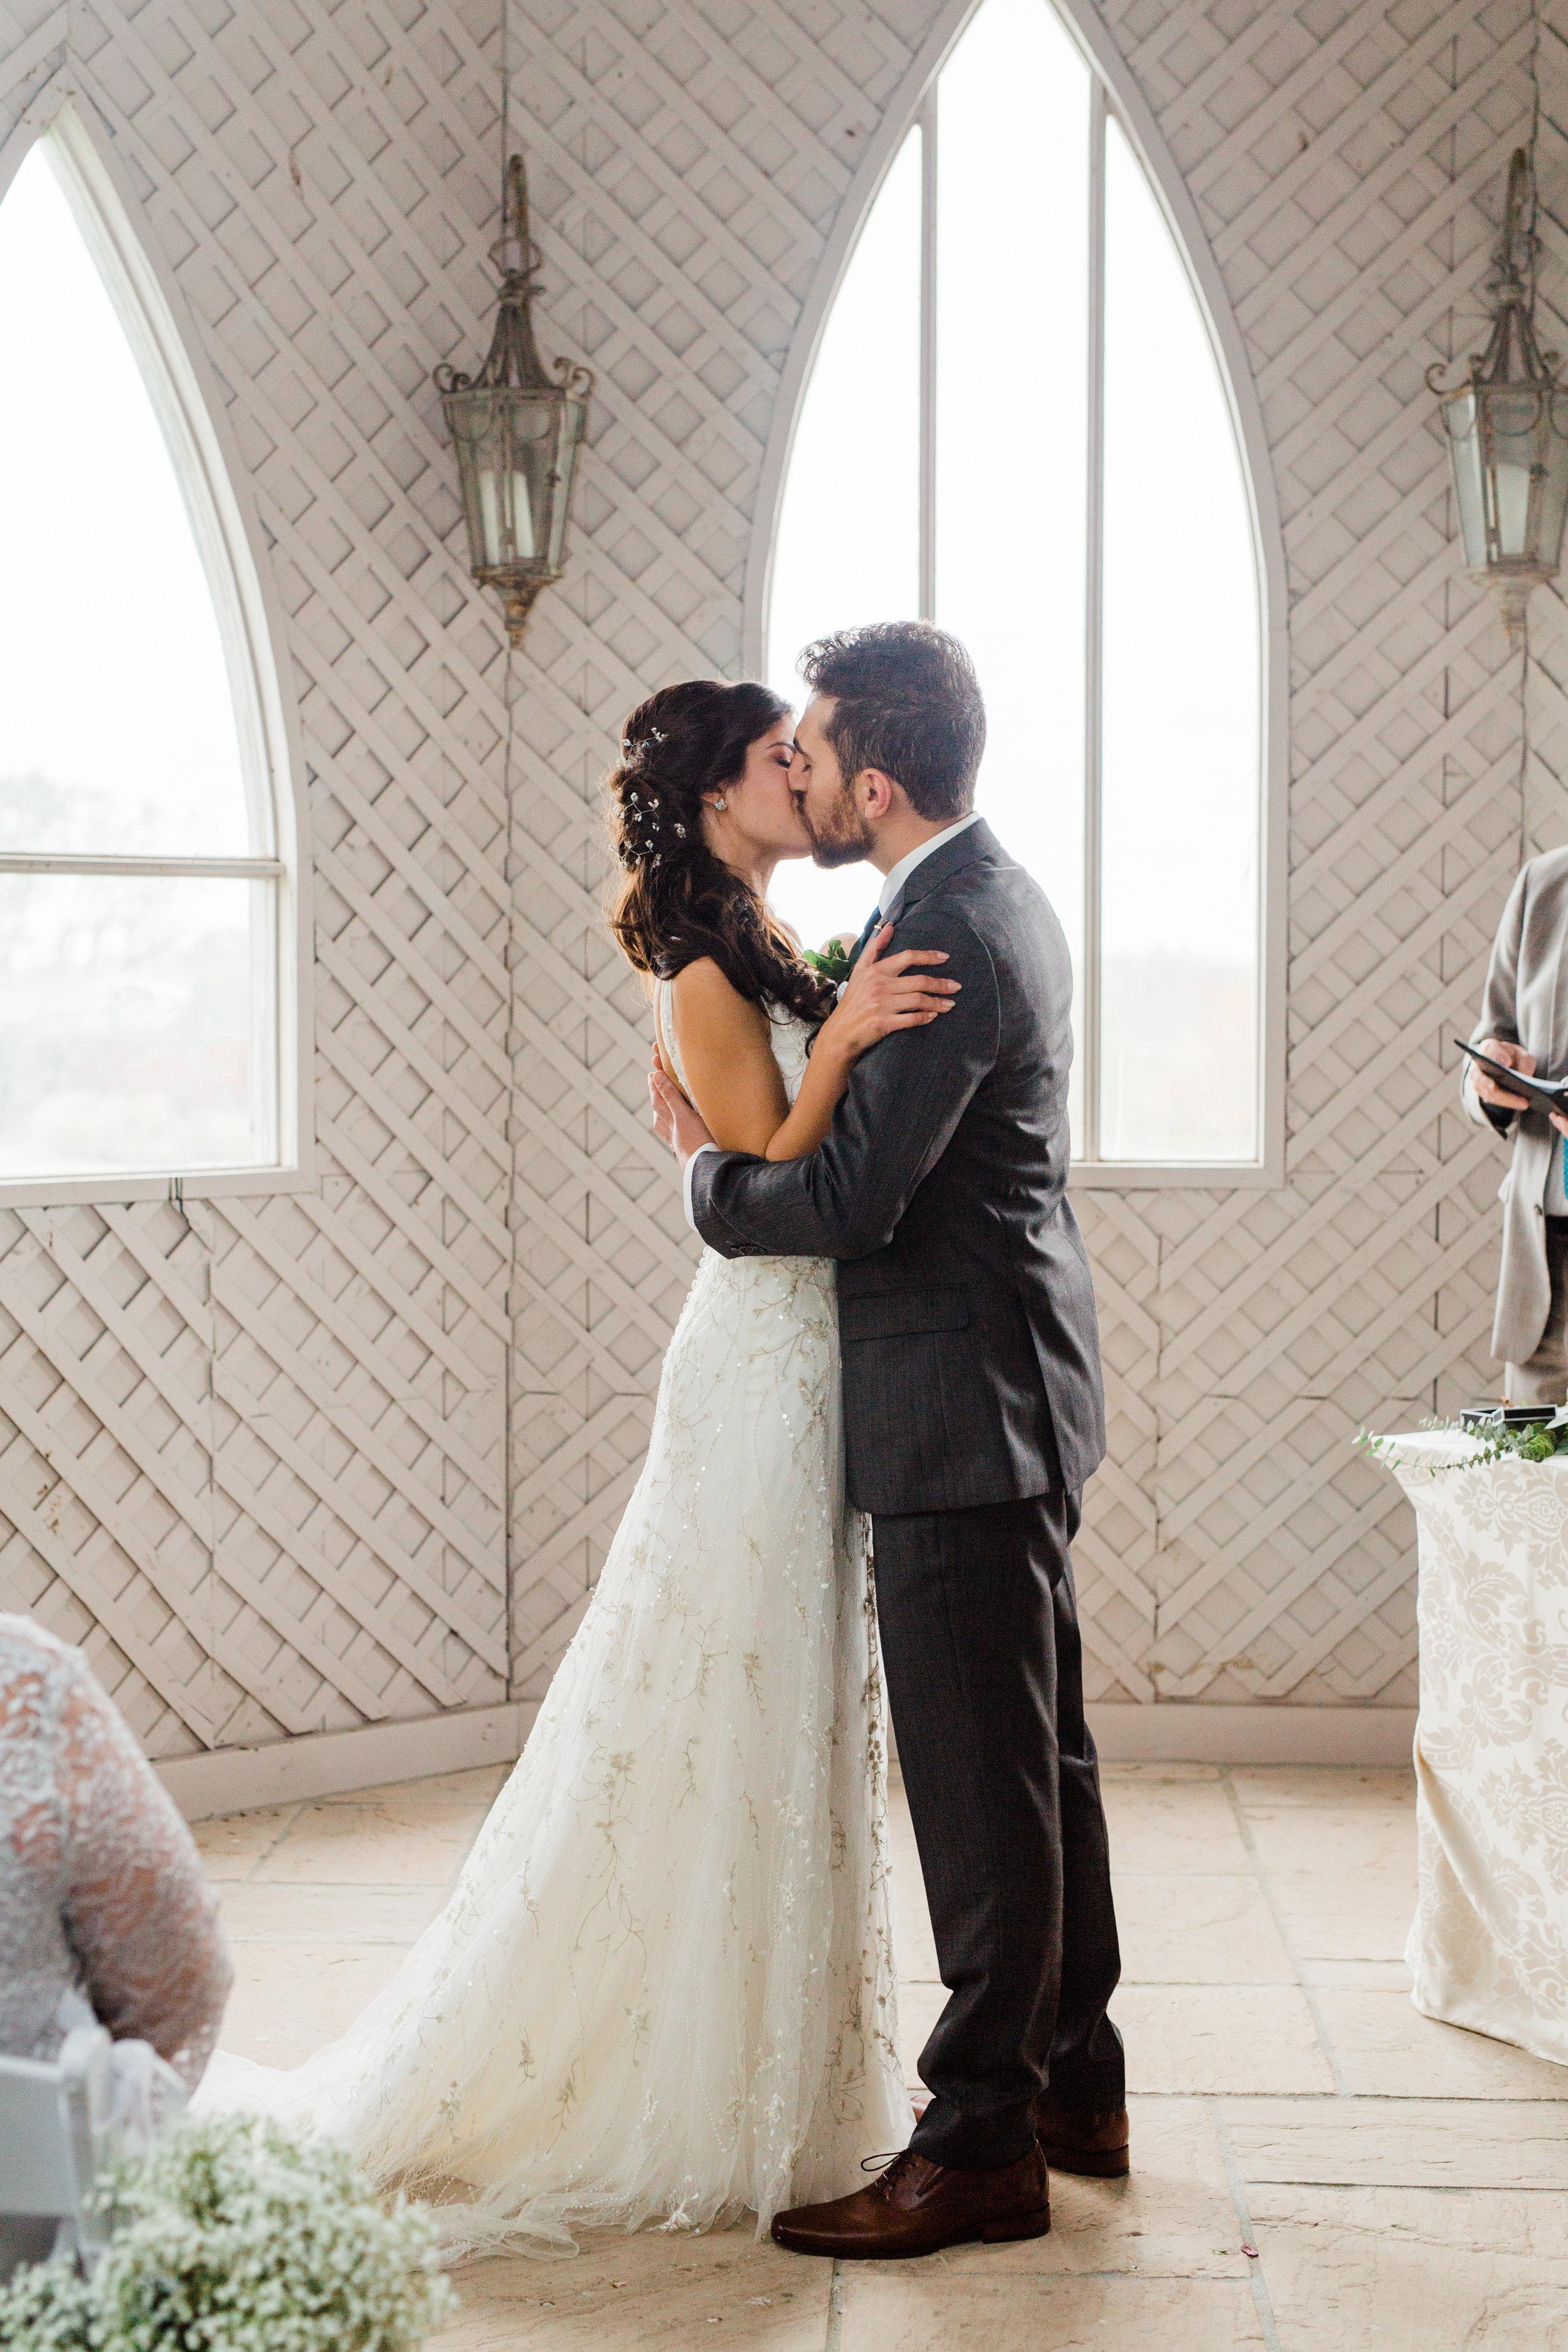 Amir-Golbazi-Danielle-Giroux-Photography_Toronto-Wedding_Cedarwood_Rachel-Paul_208.jpg